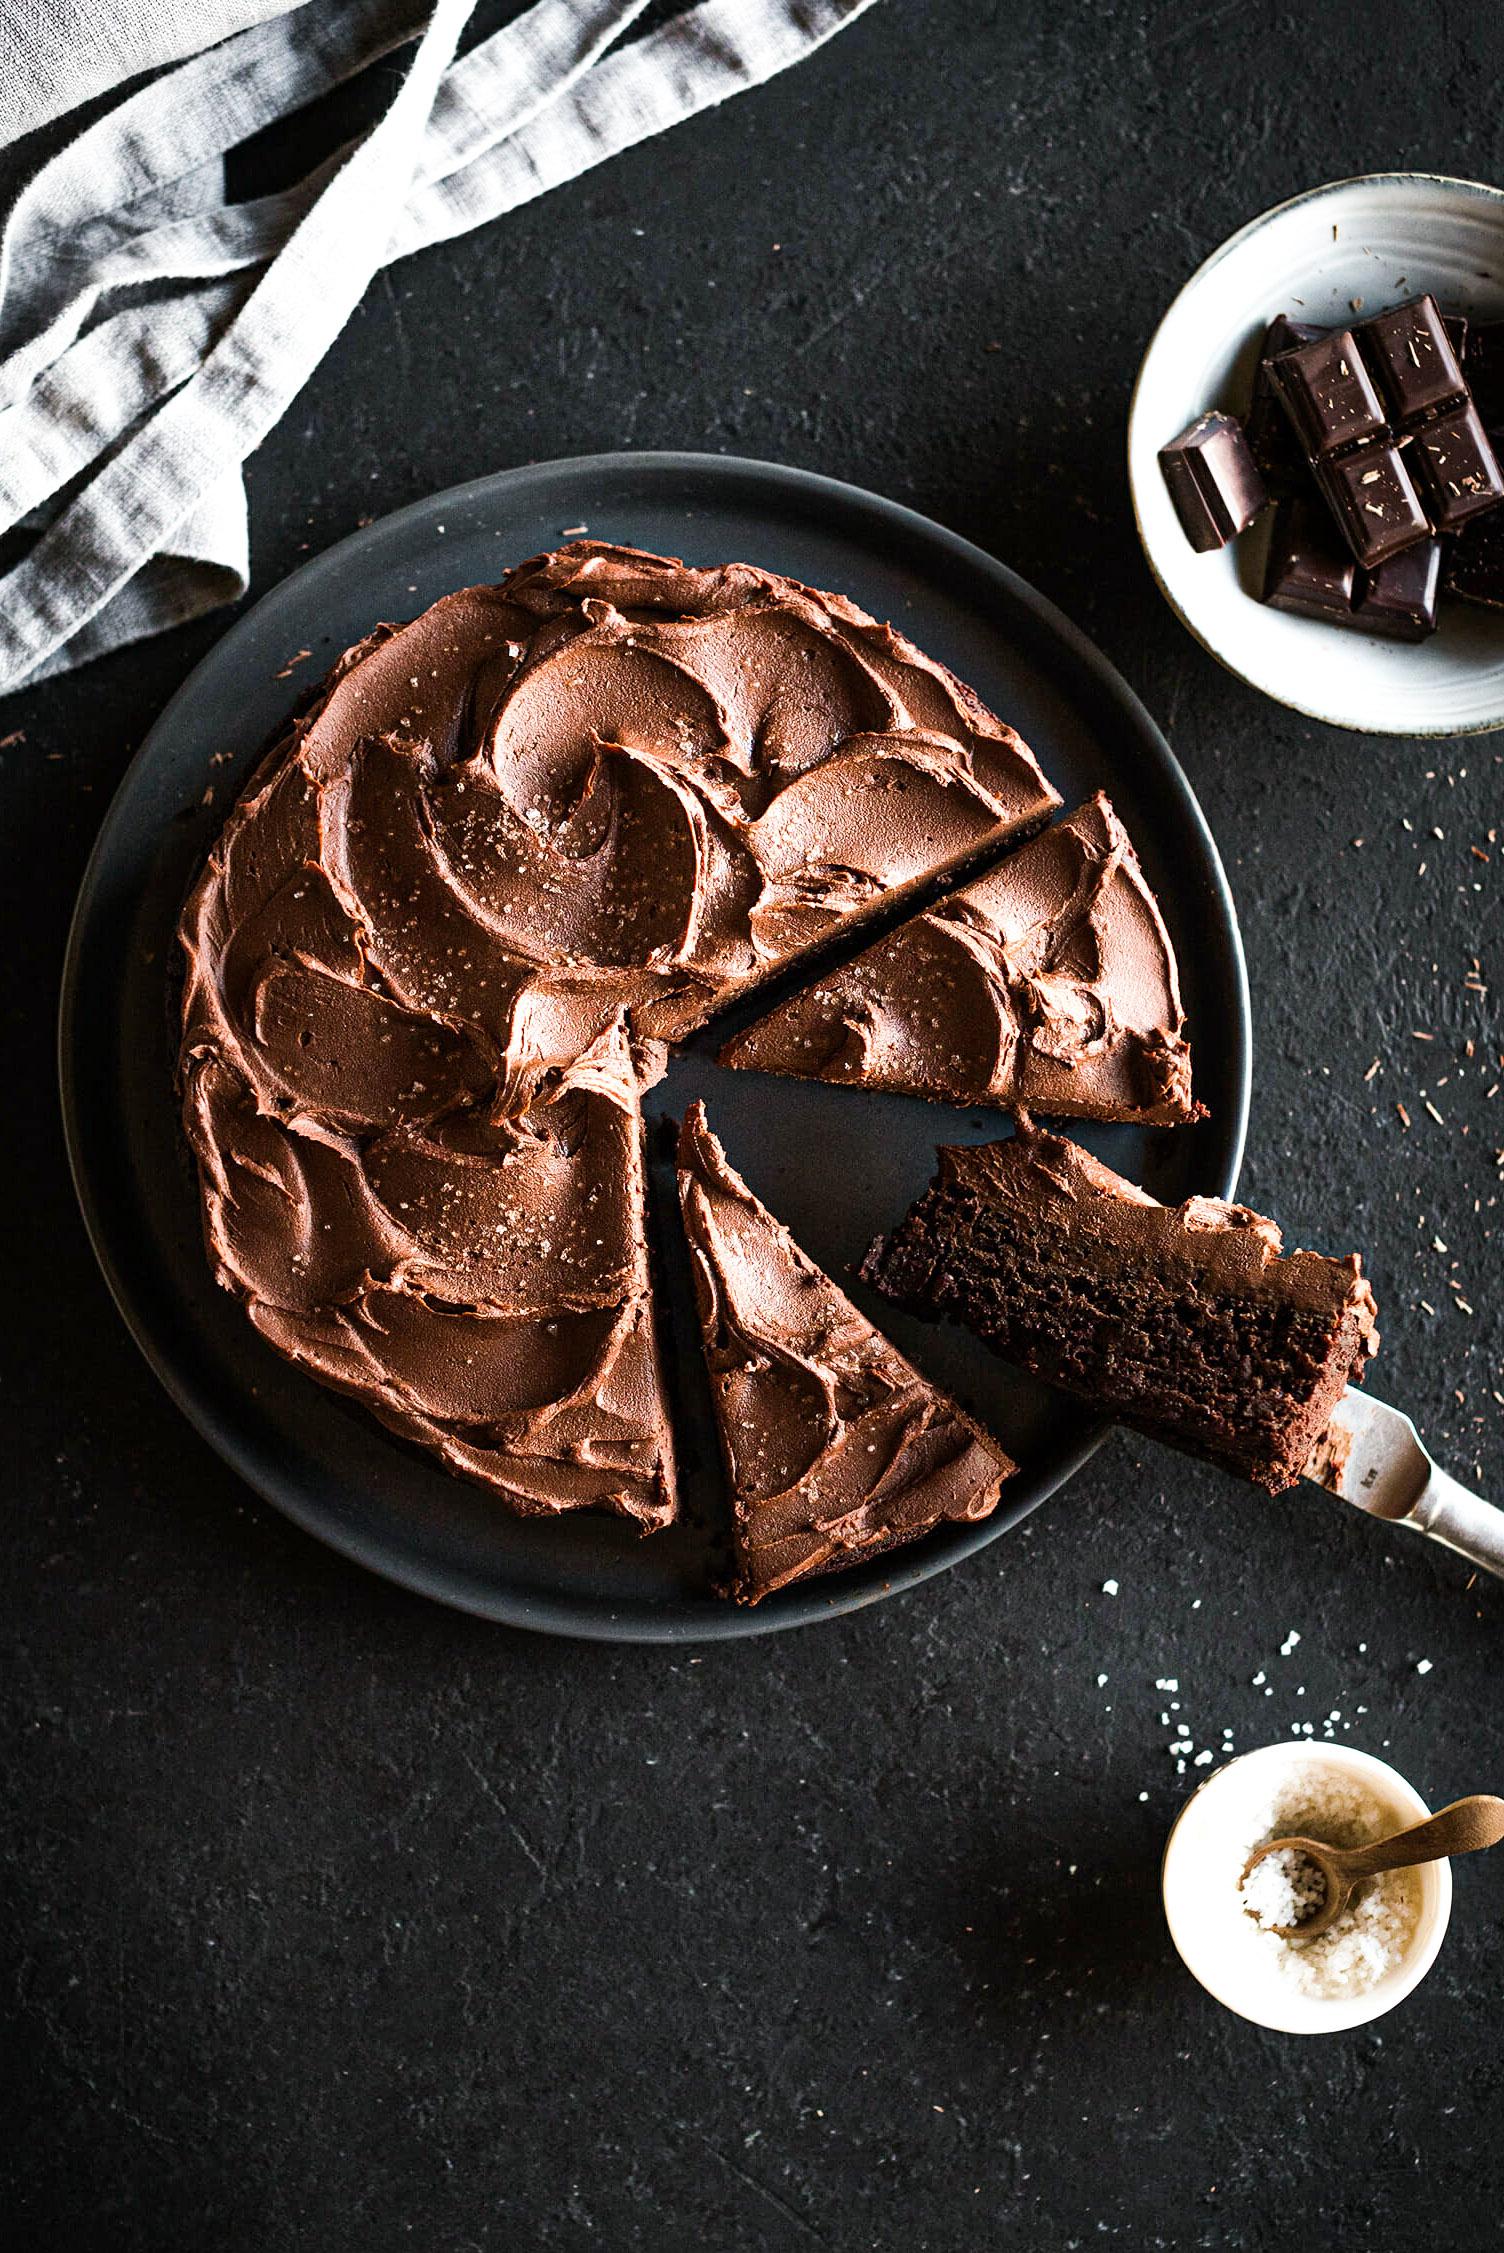 Gâteau chocolat vegan recette - Lilie Bakery